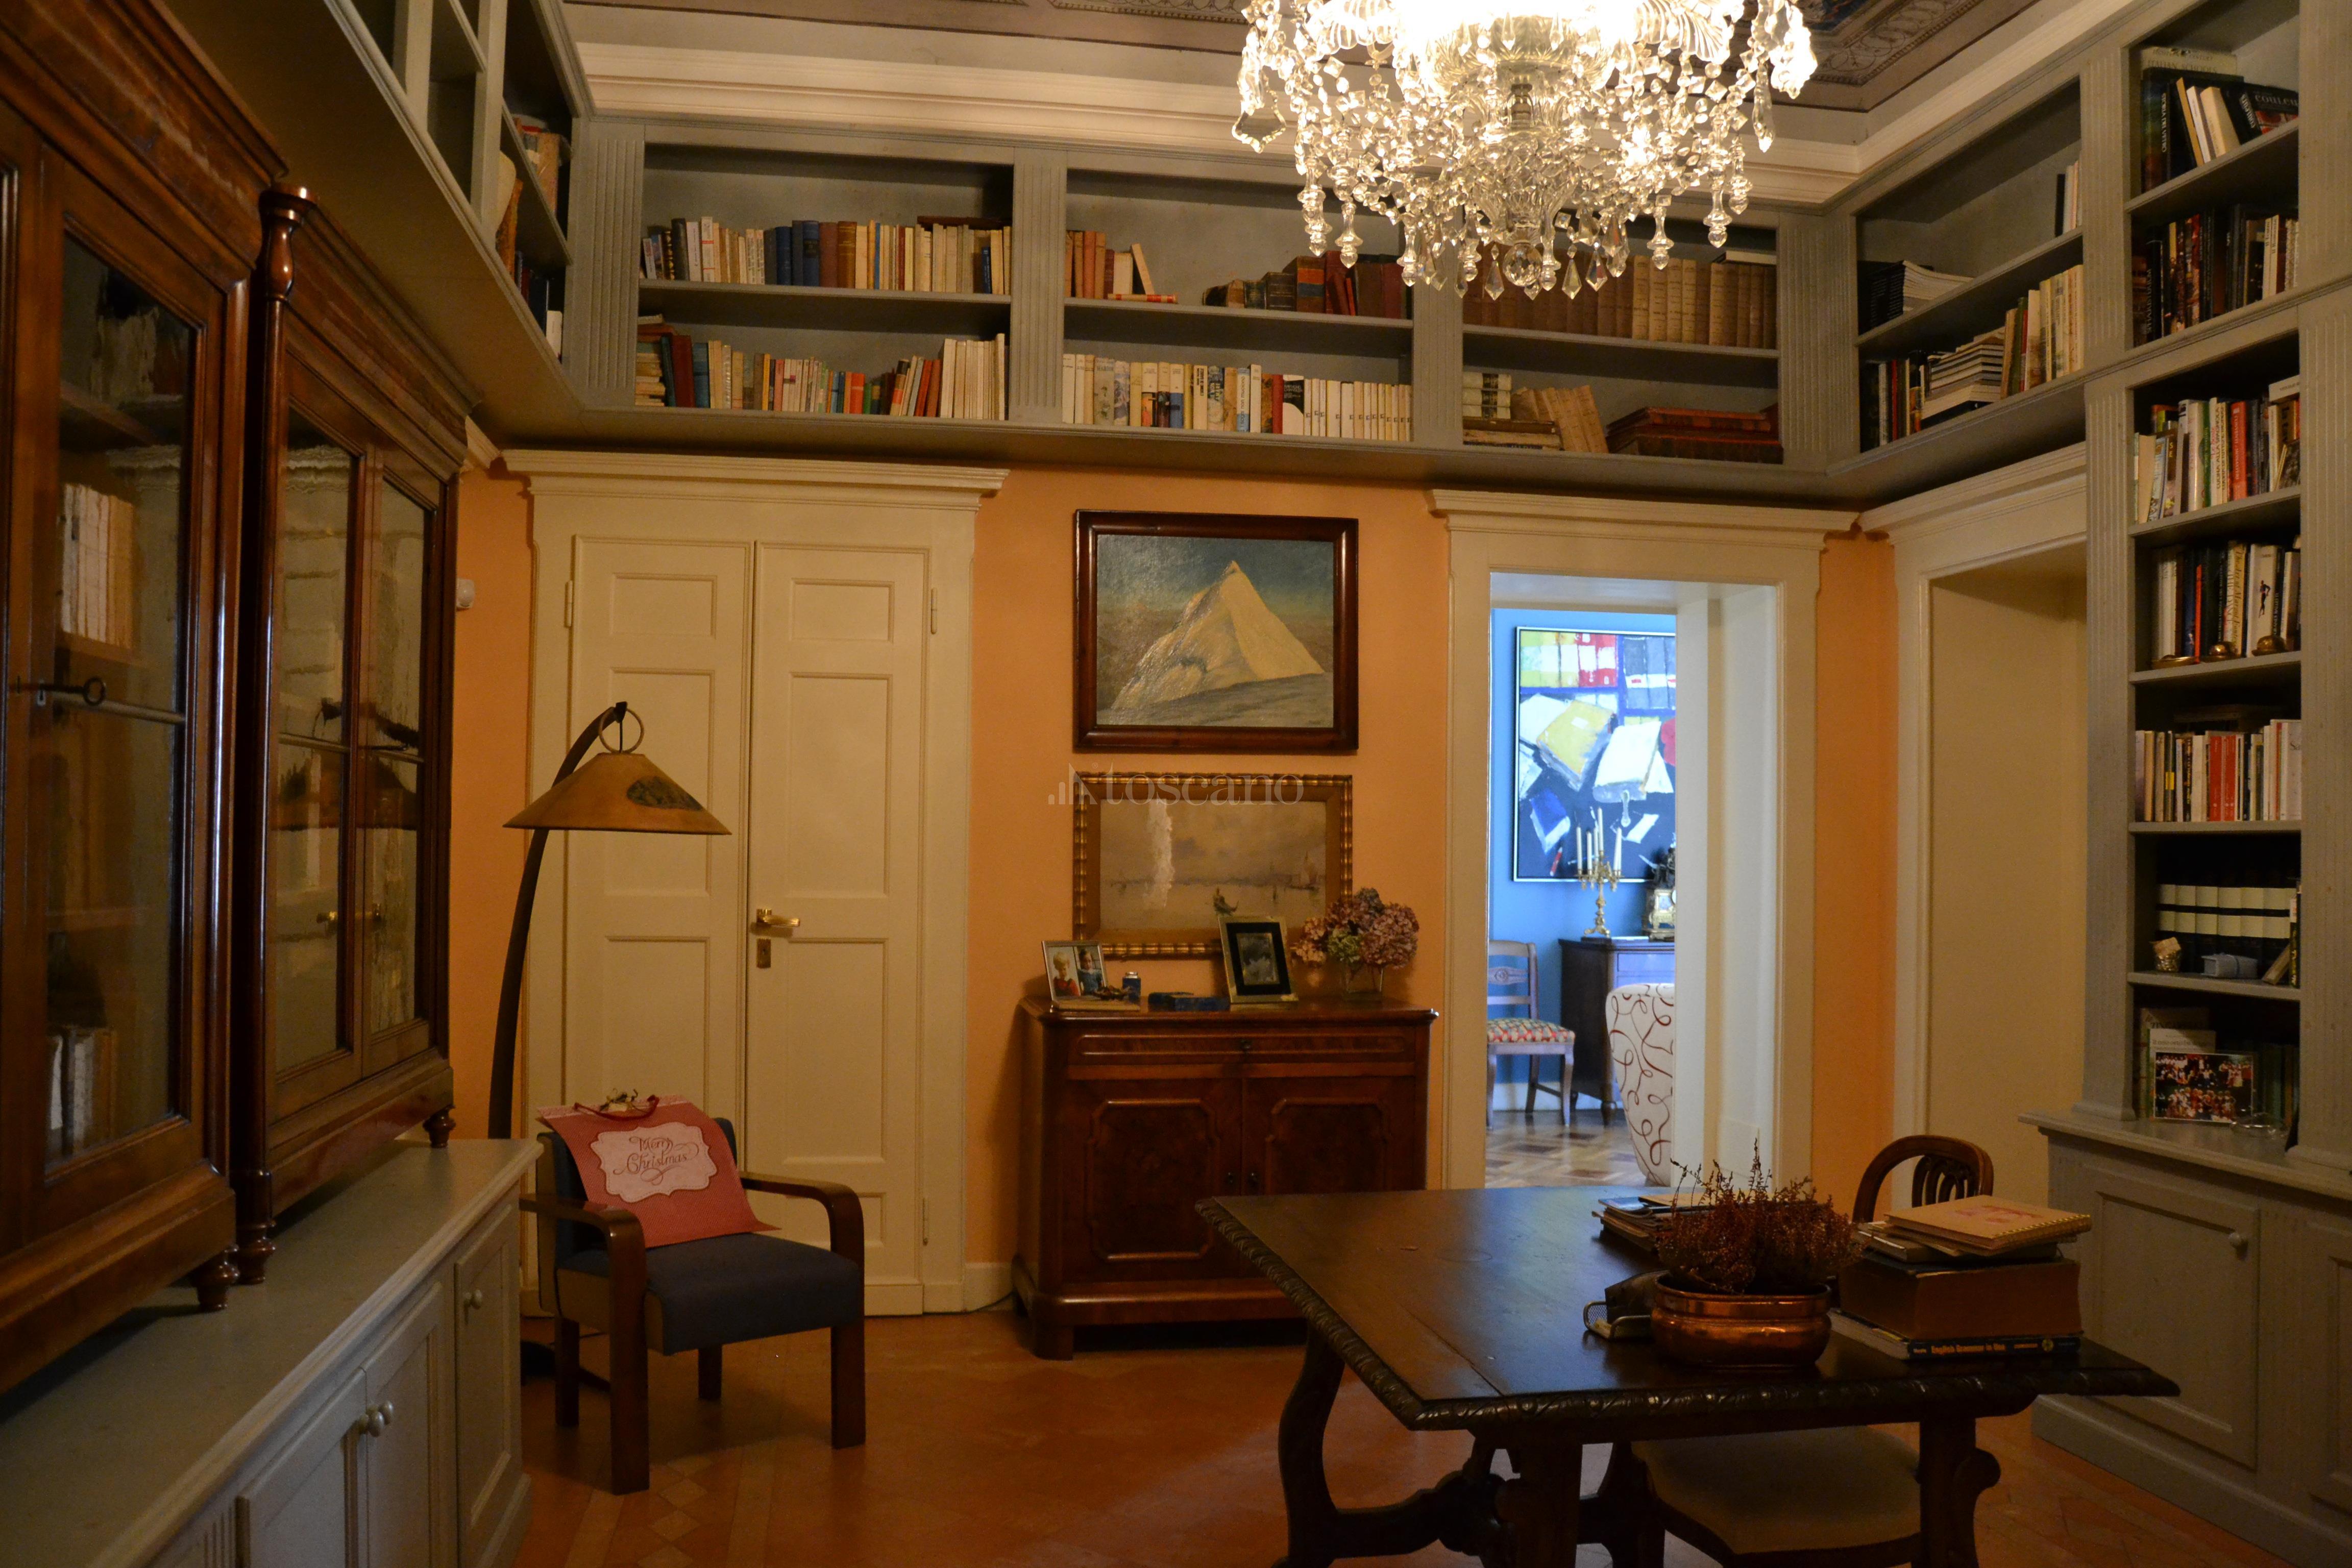 Vendita casa a como in via rovelli citt murata 54 2017 for Toscano immobiliare como